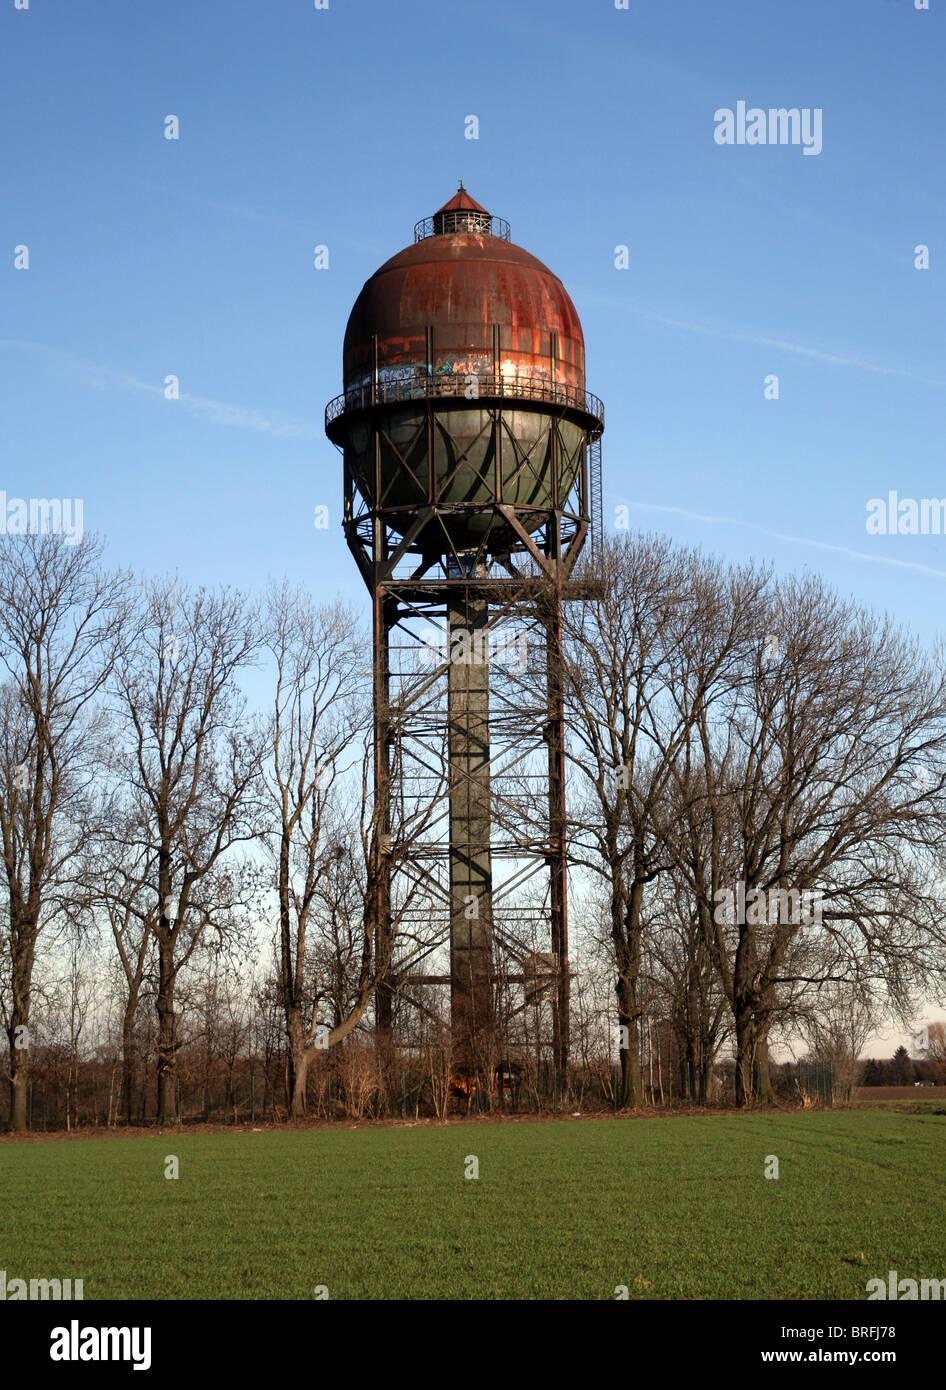 Lanstroper Ei water tower, Ruhr area, North Rhine-Westphalia, Germany, Europe - Stock Image